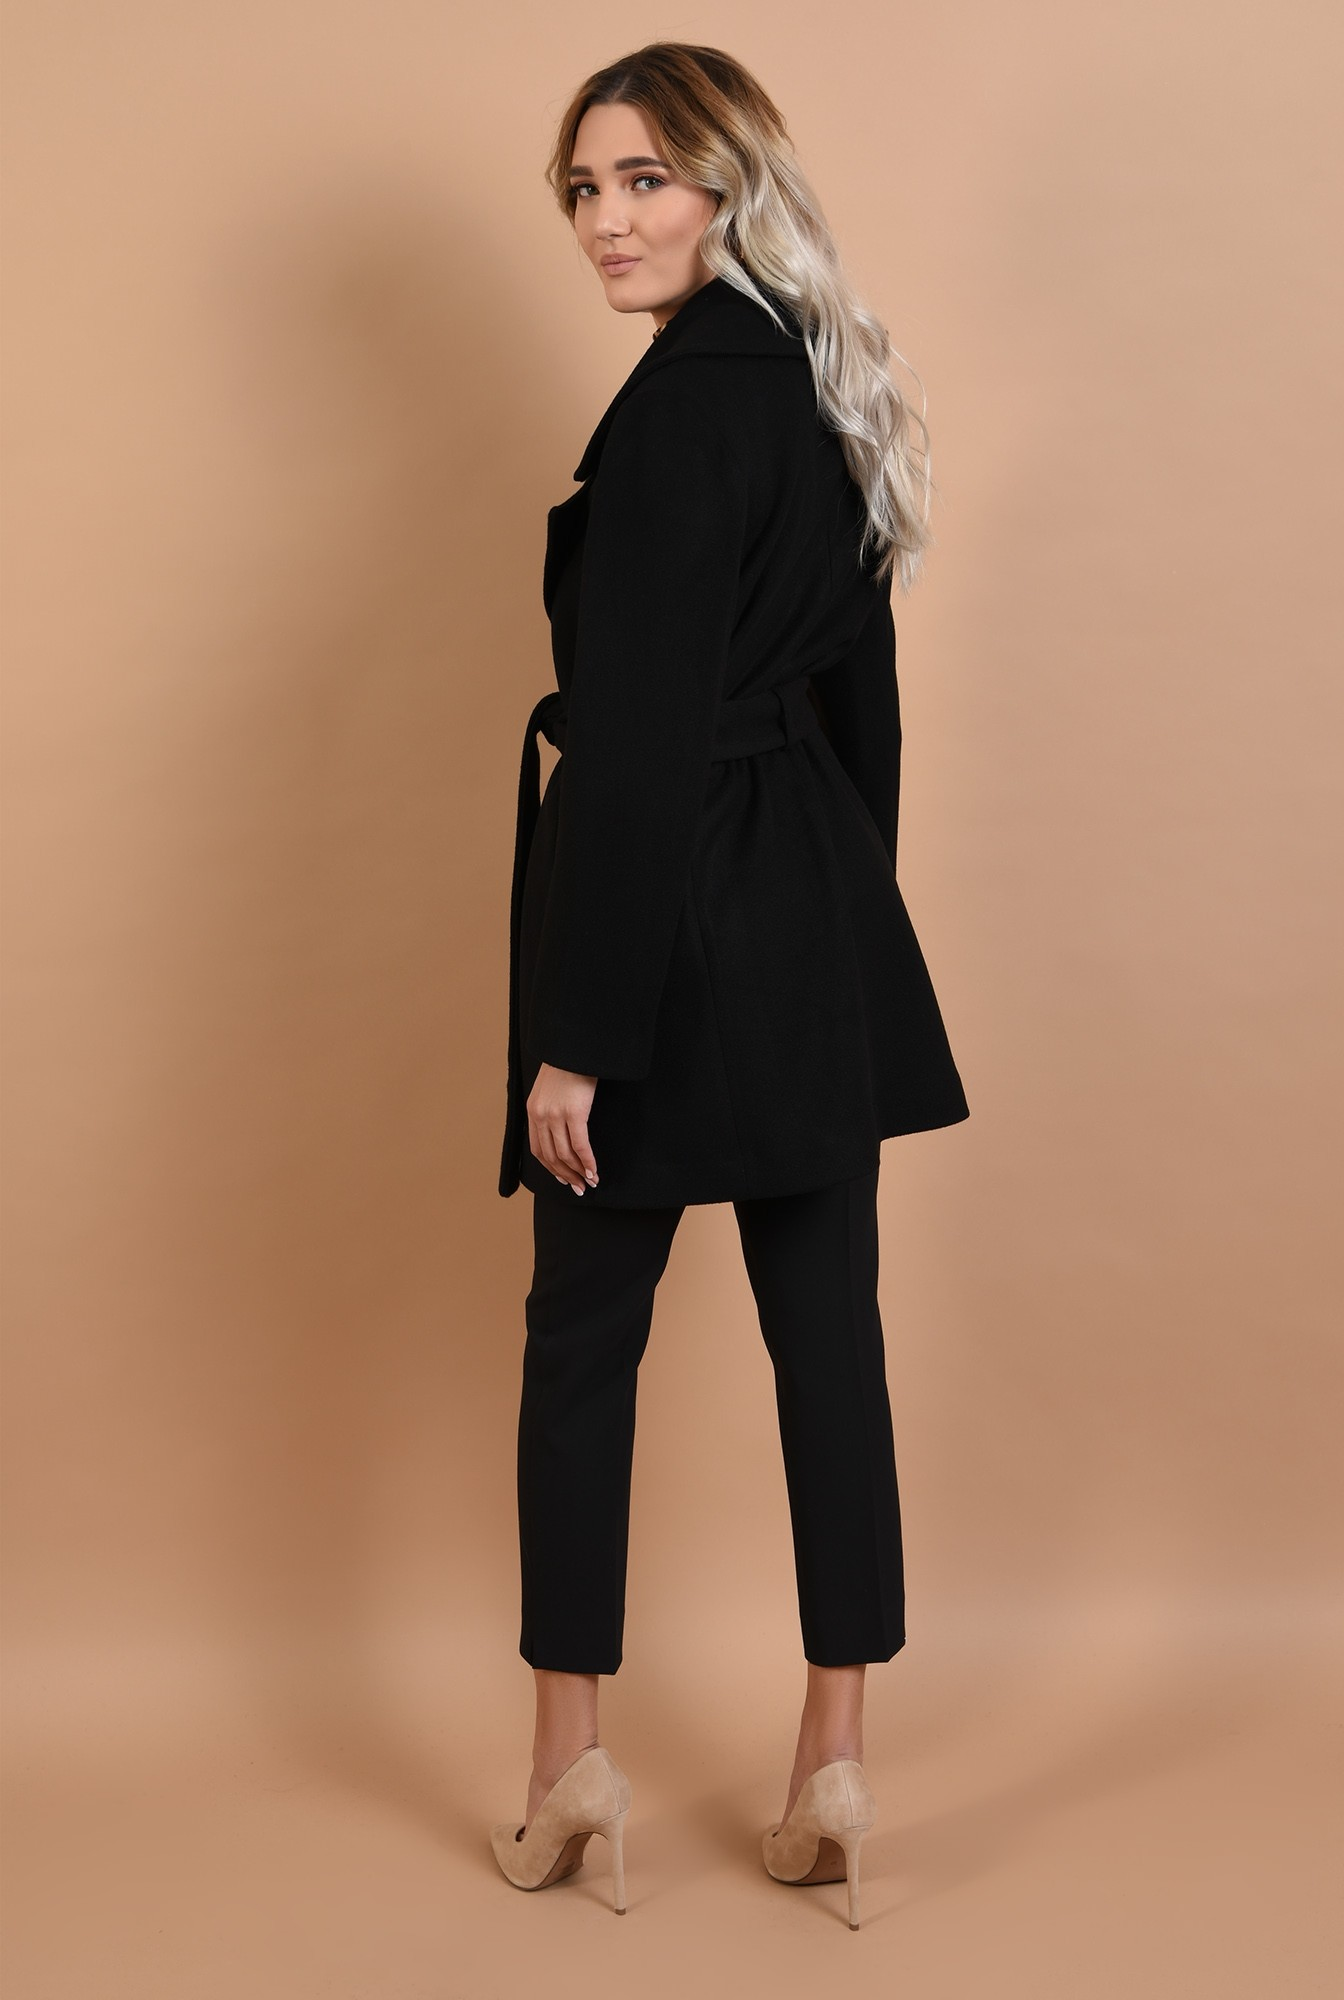 1 - palton scurt, drept, cu cordon, cu revere, palton Poema